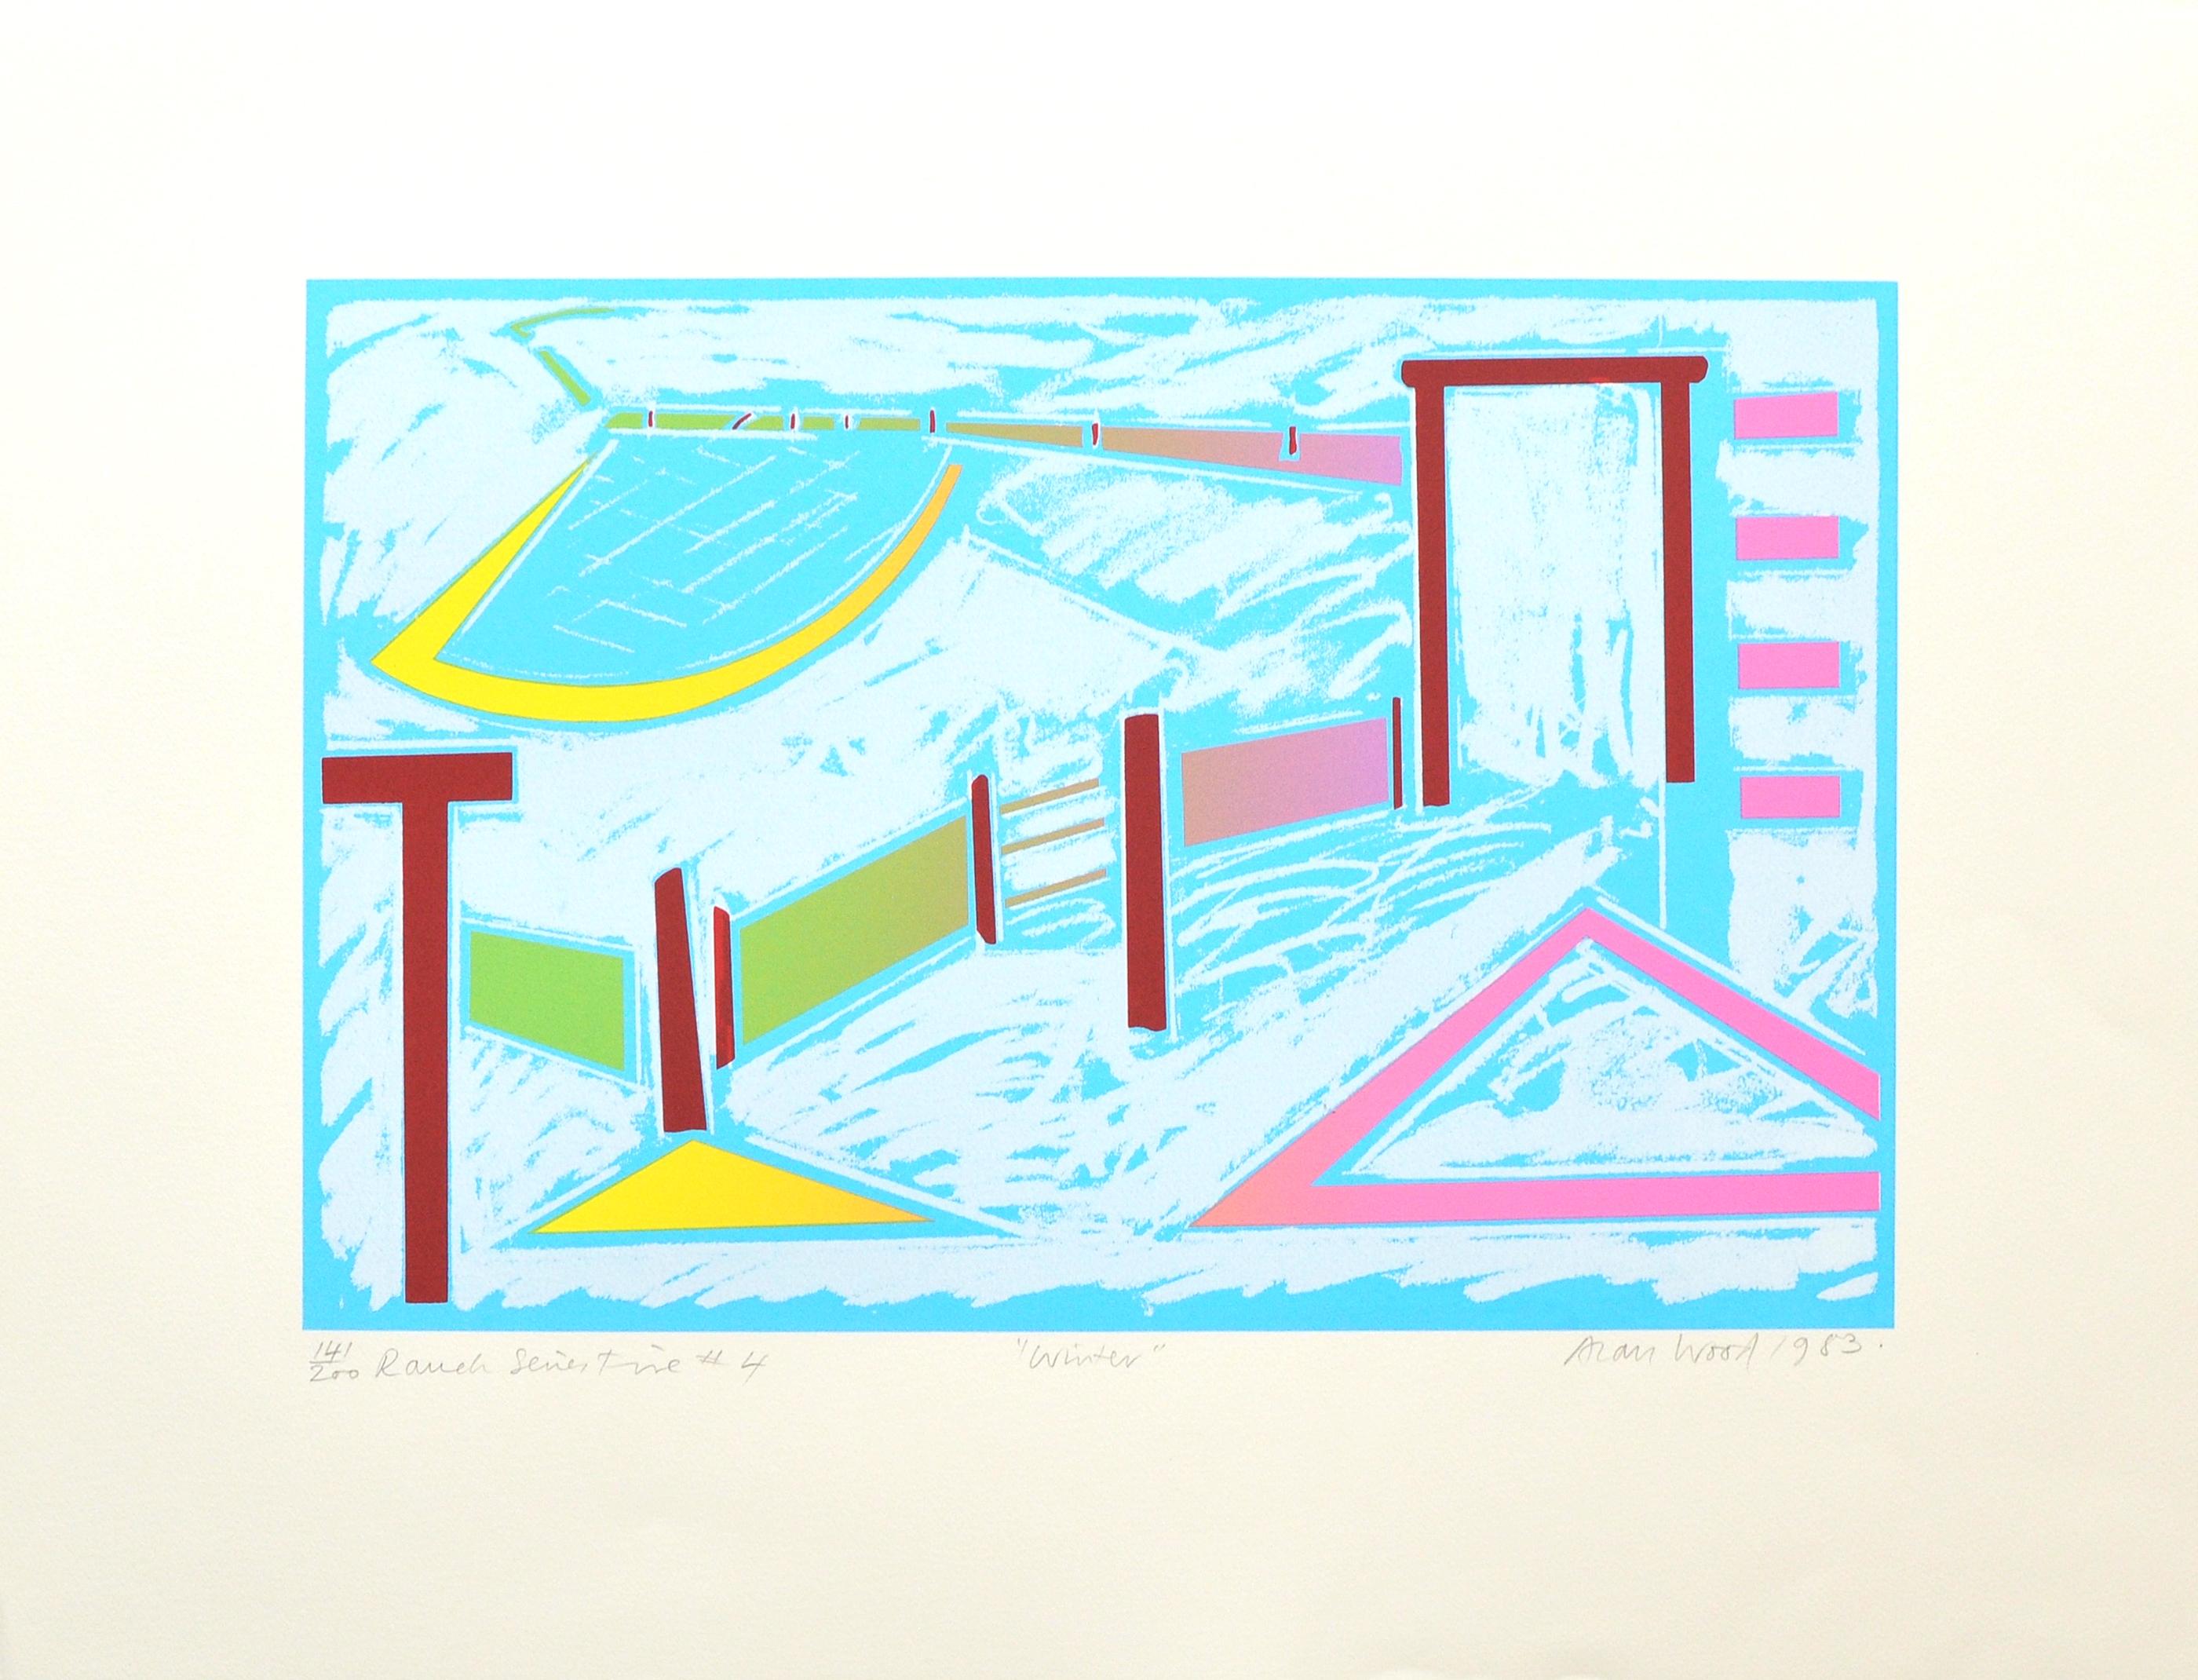 Alan_Woods_1983_Prints_#41_RanchSeriesFive#4_Winter